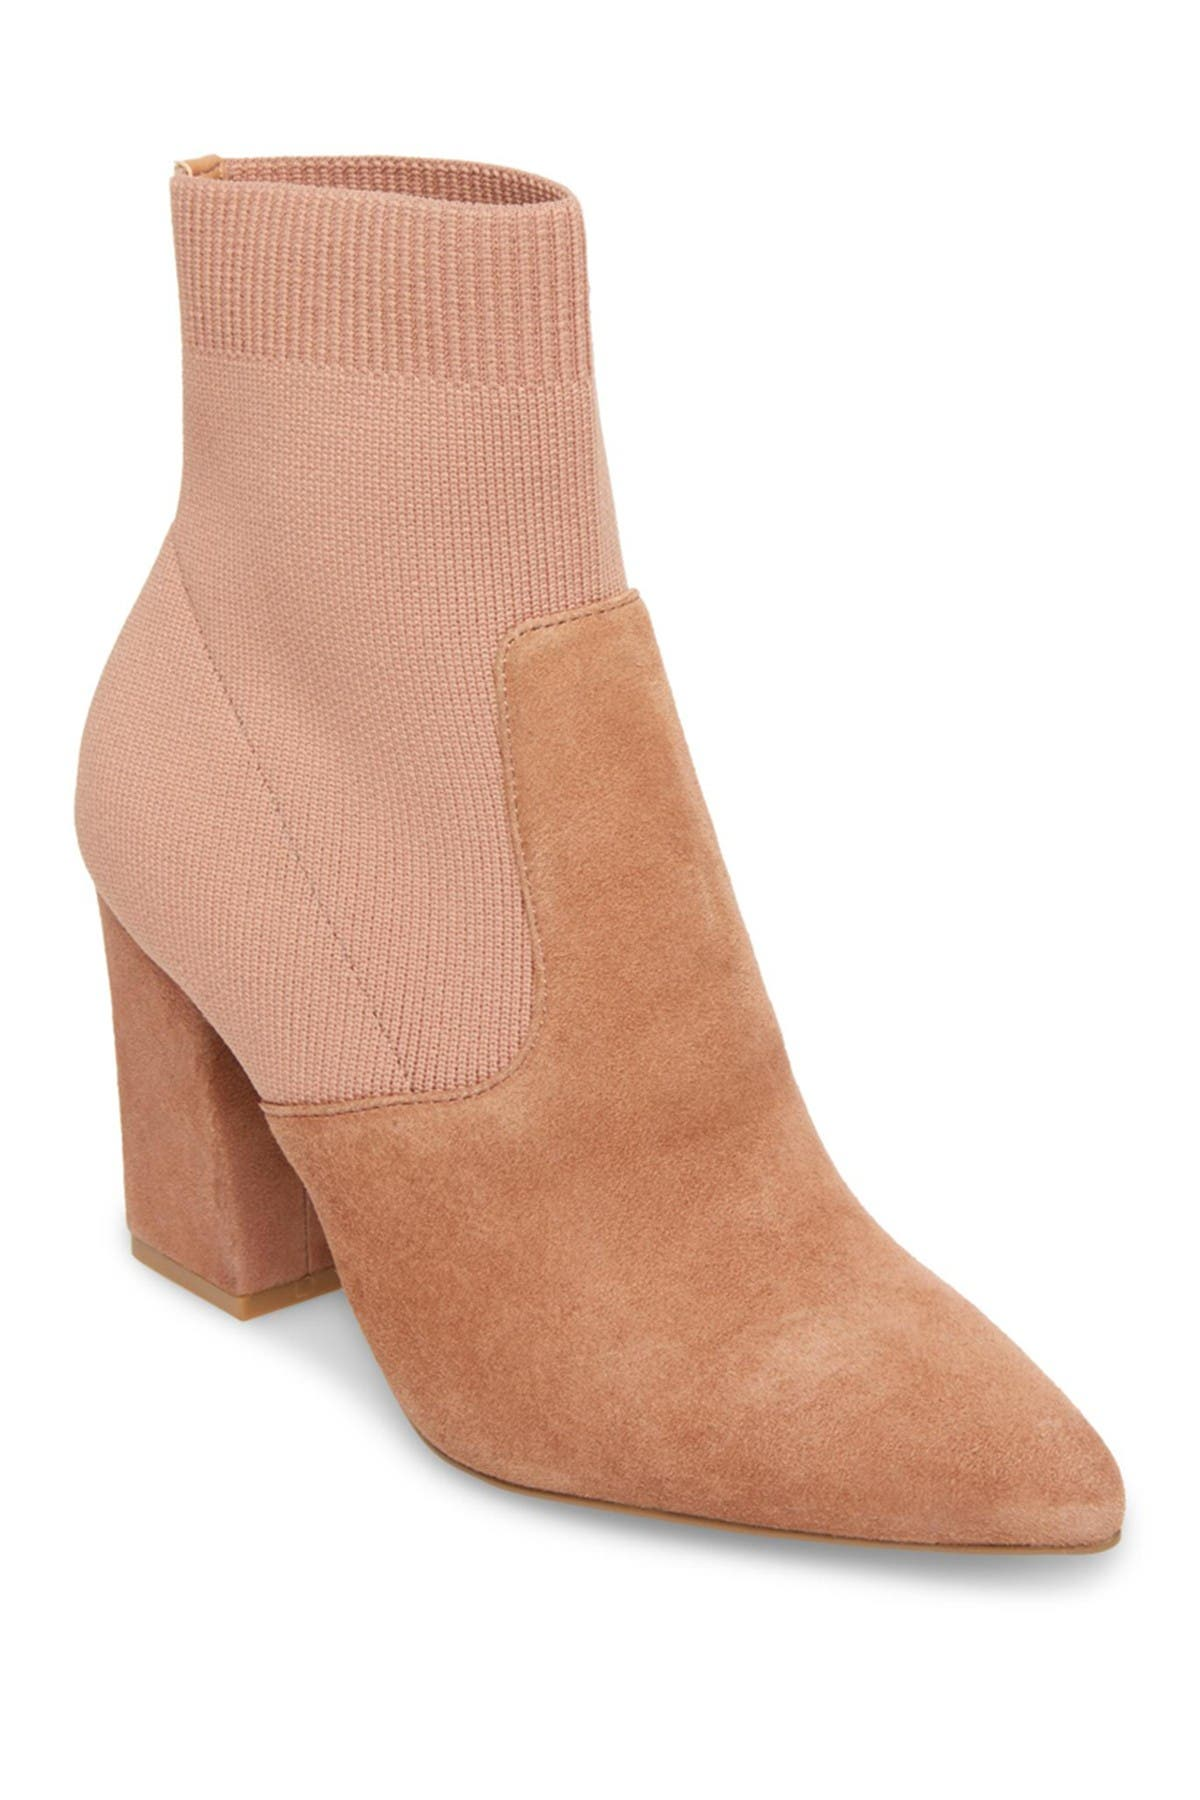 Steve Madden   Remy Sock Bootie